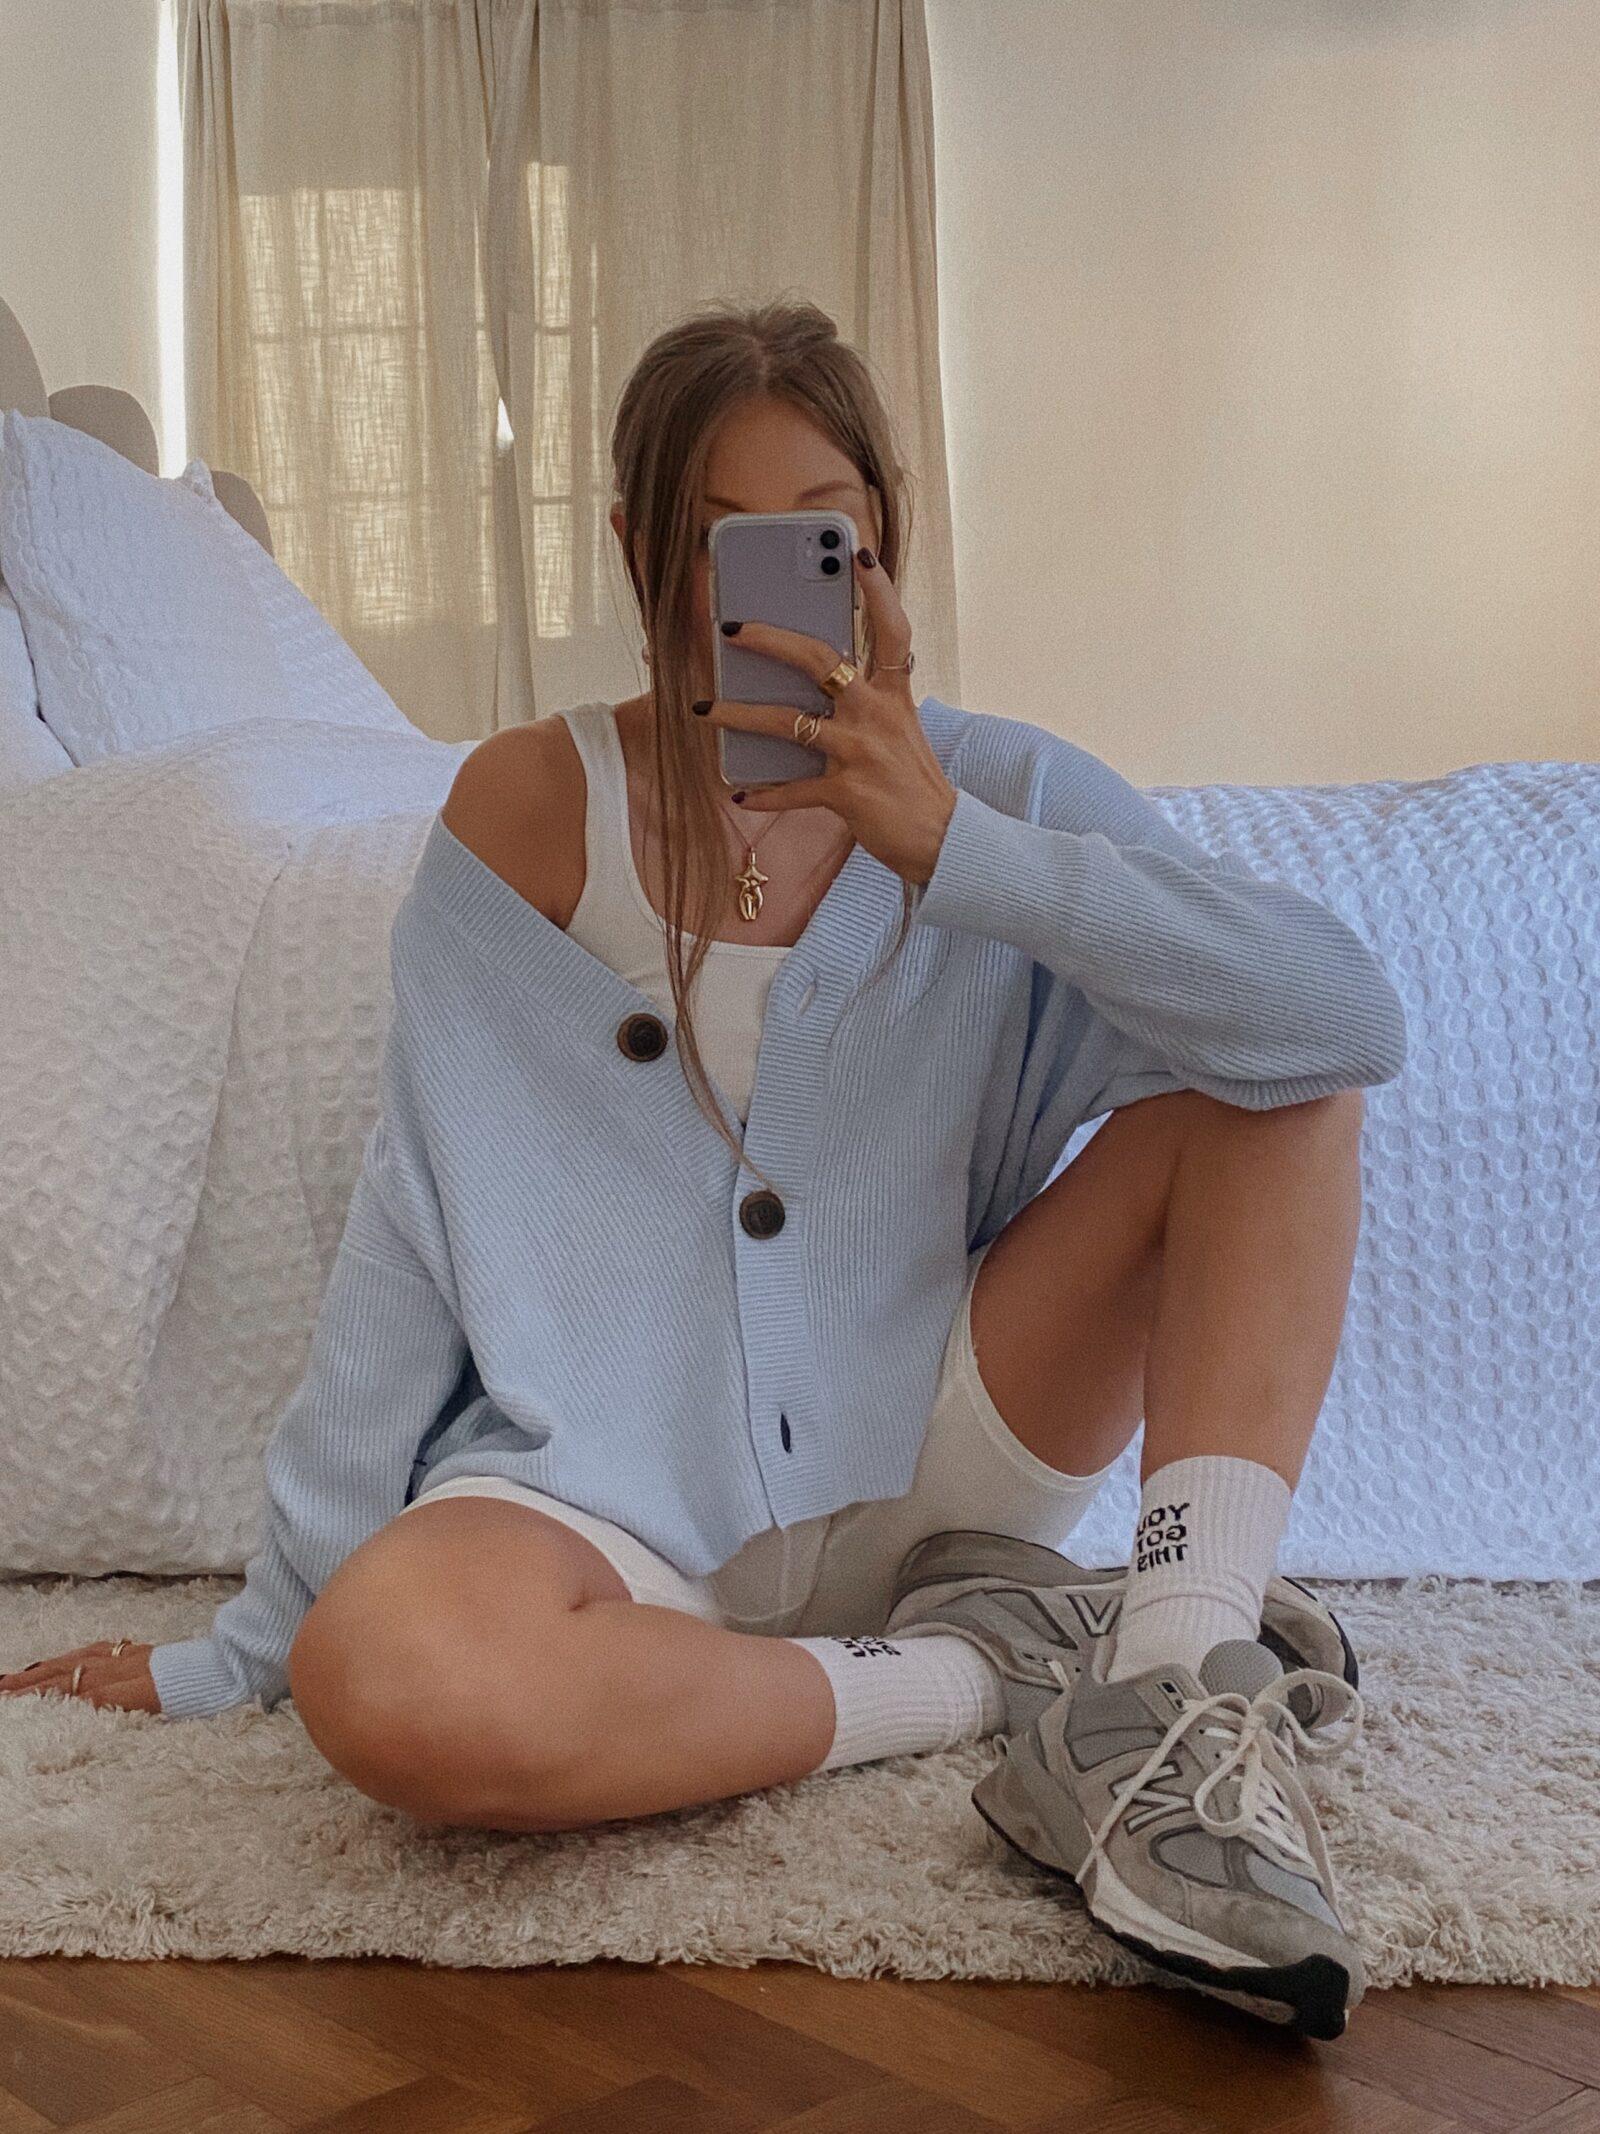 Amazon Black Friday Deals - Amazon Fashion Blue Cardigan